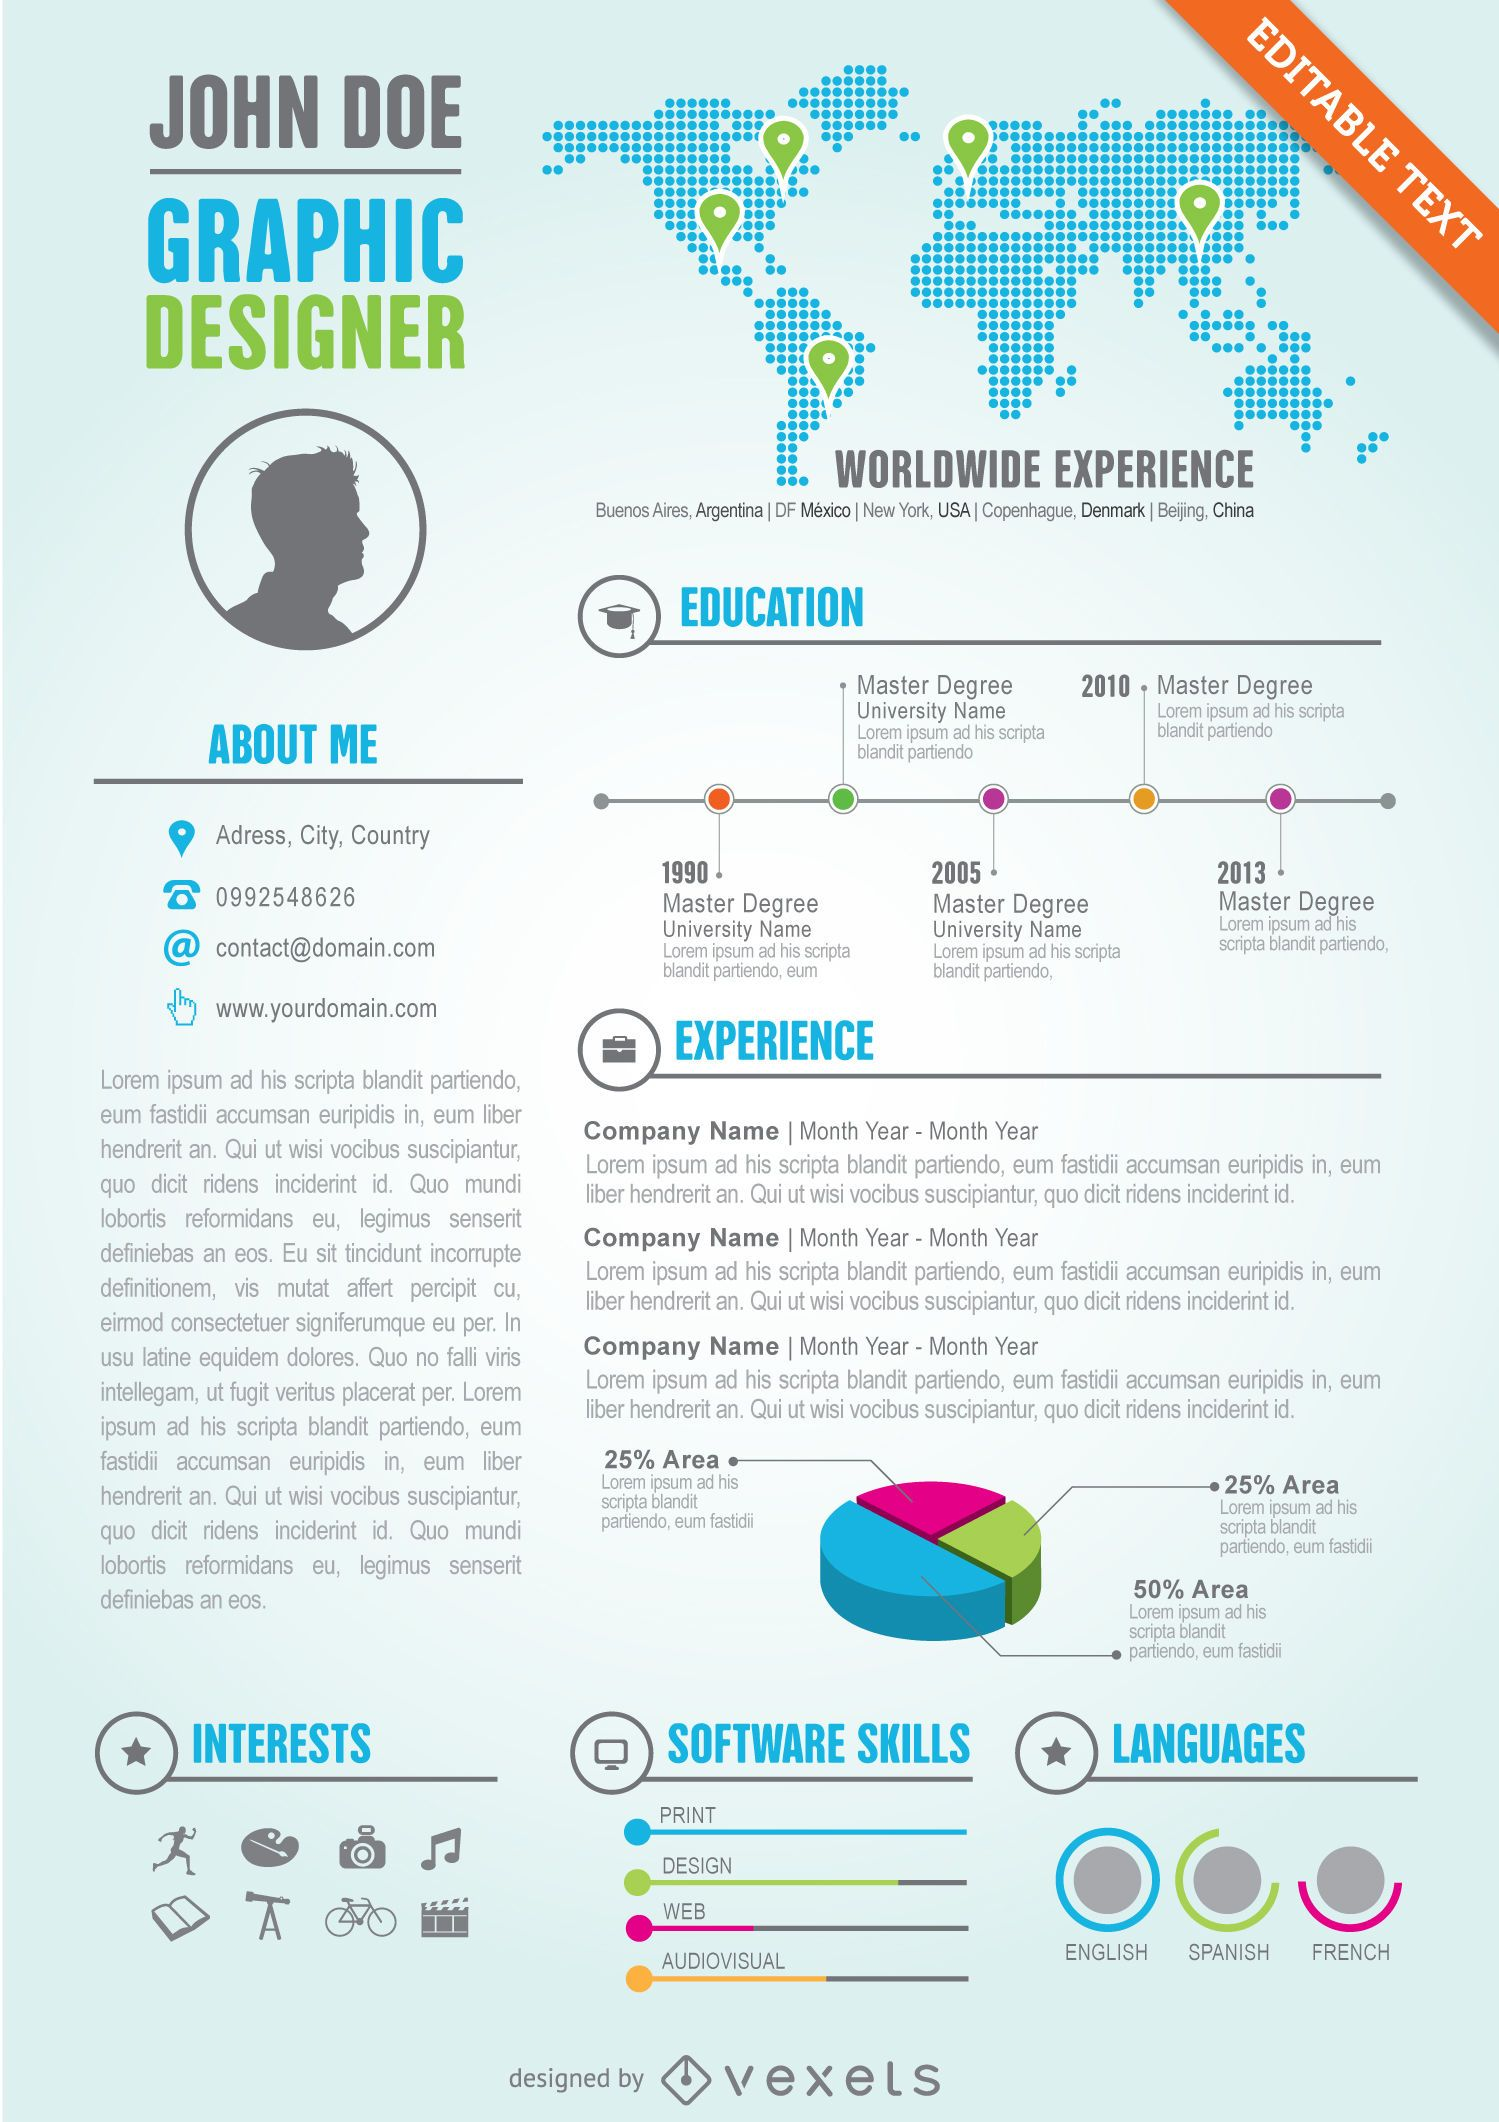 Diseñador Gráfico plantilla cv curriculum vitae editable - Descargar ...